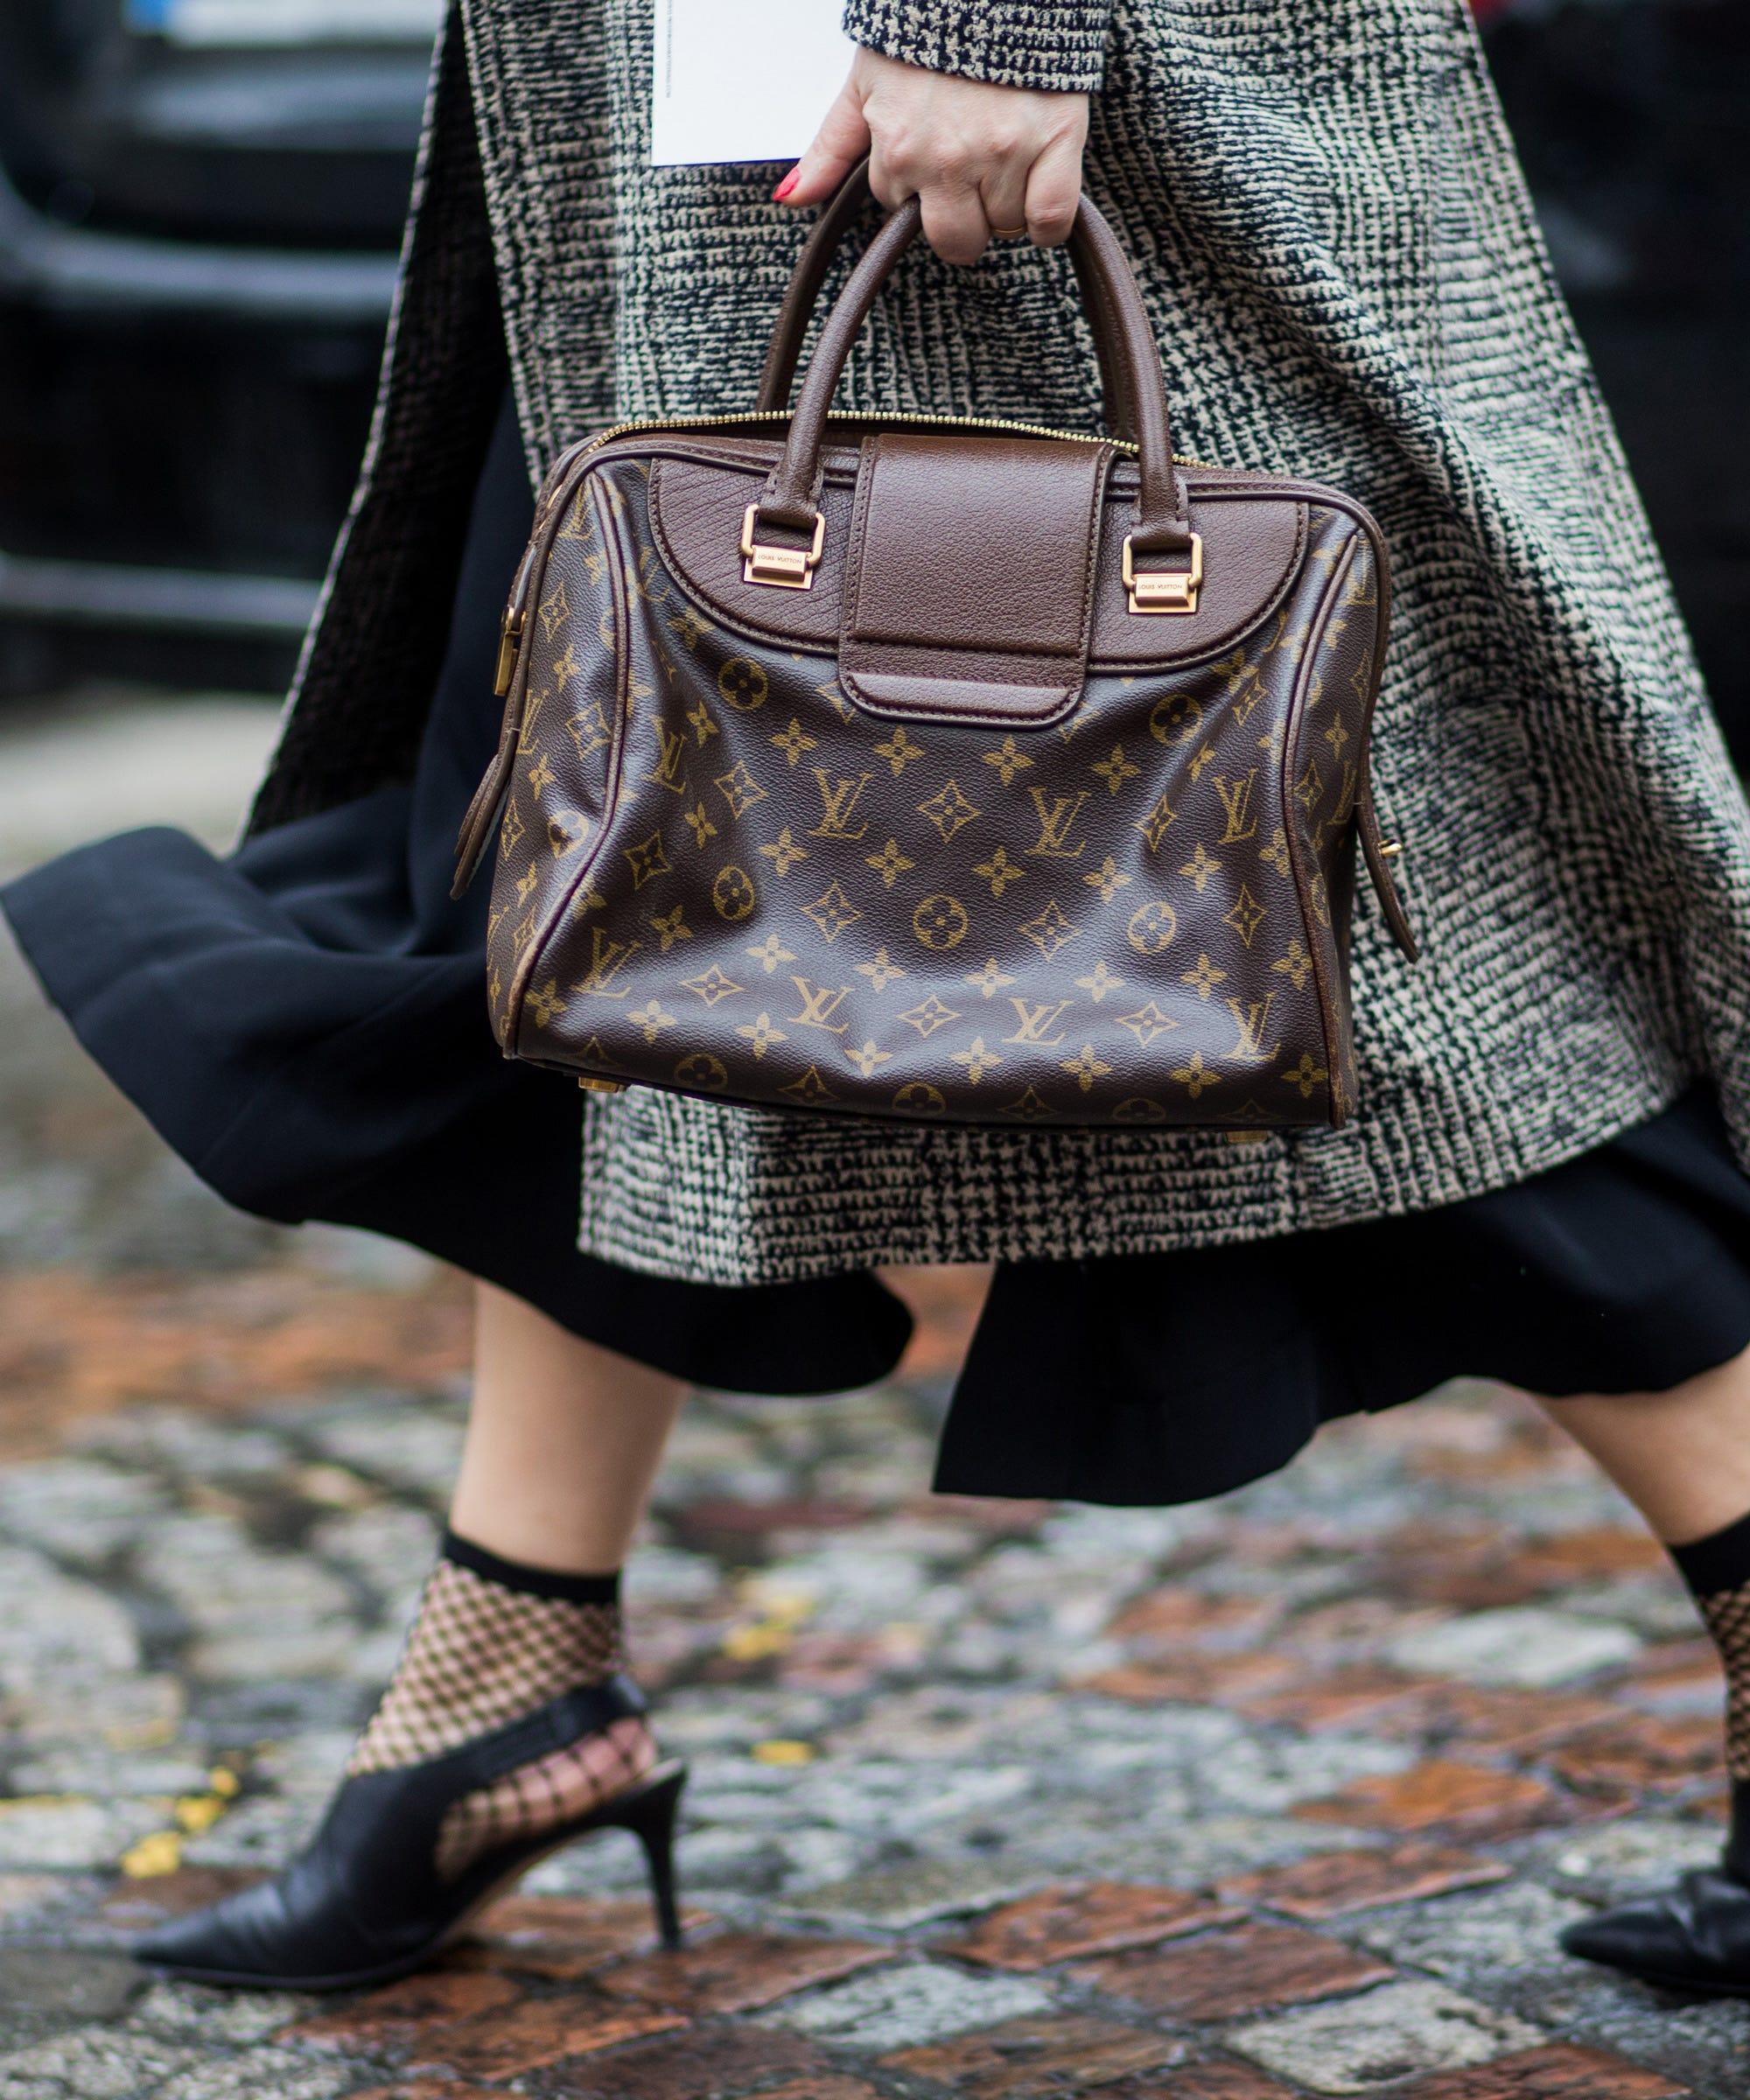 7edf4d8f1e86 Louis Vuitton Logo Handbag Trend Street Style Accessory